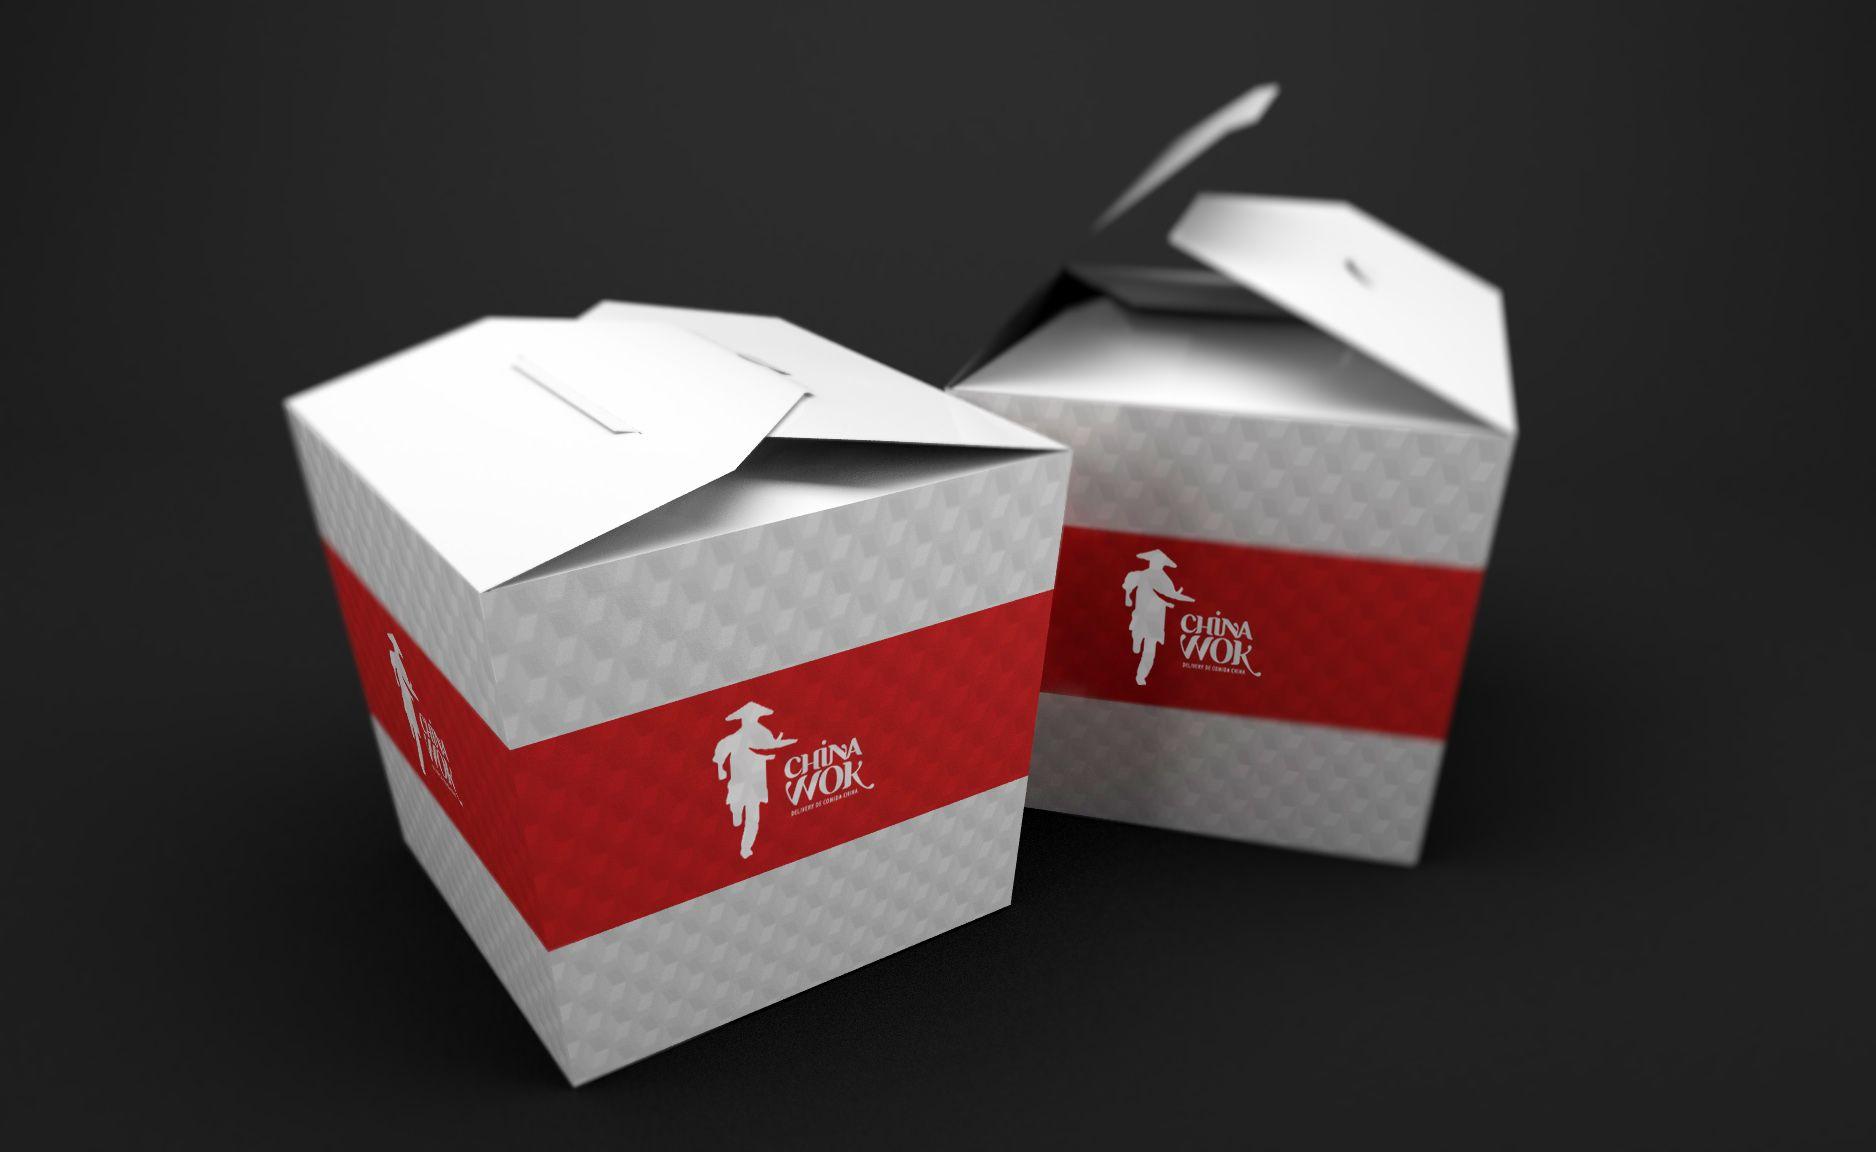 Food Box China Wok Branding Mockups Psd Branding Mockup Psd Free Branding Mockups